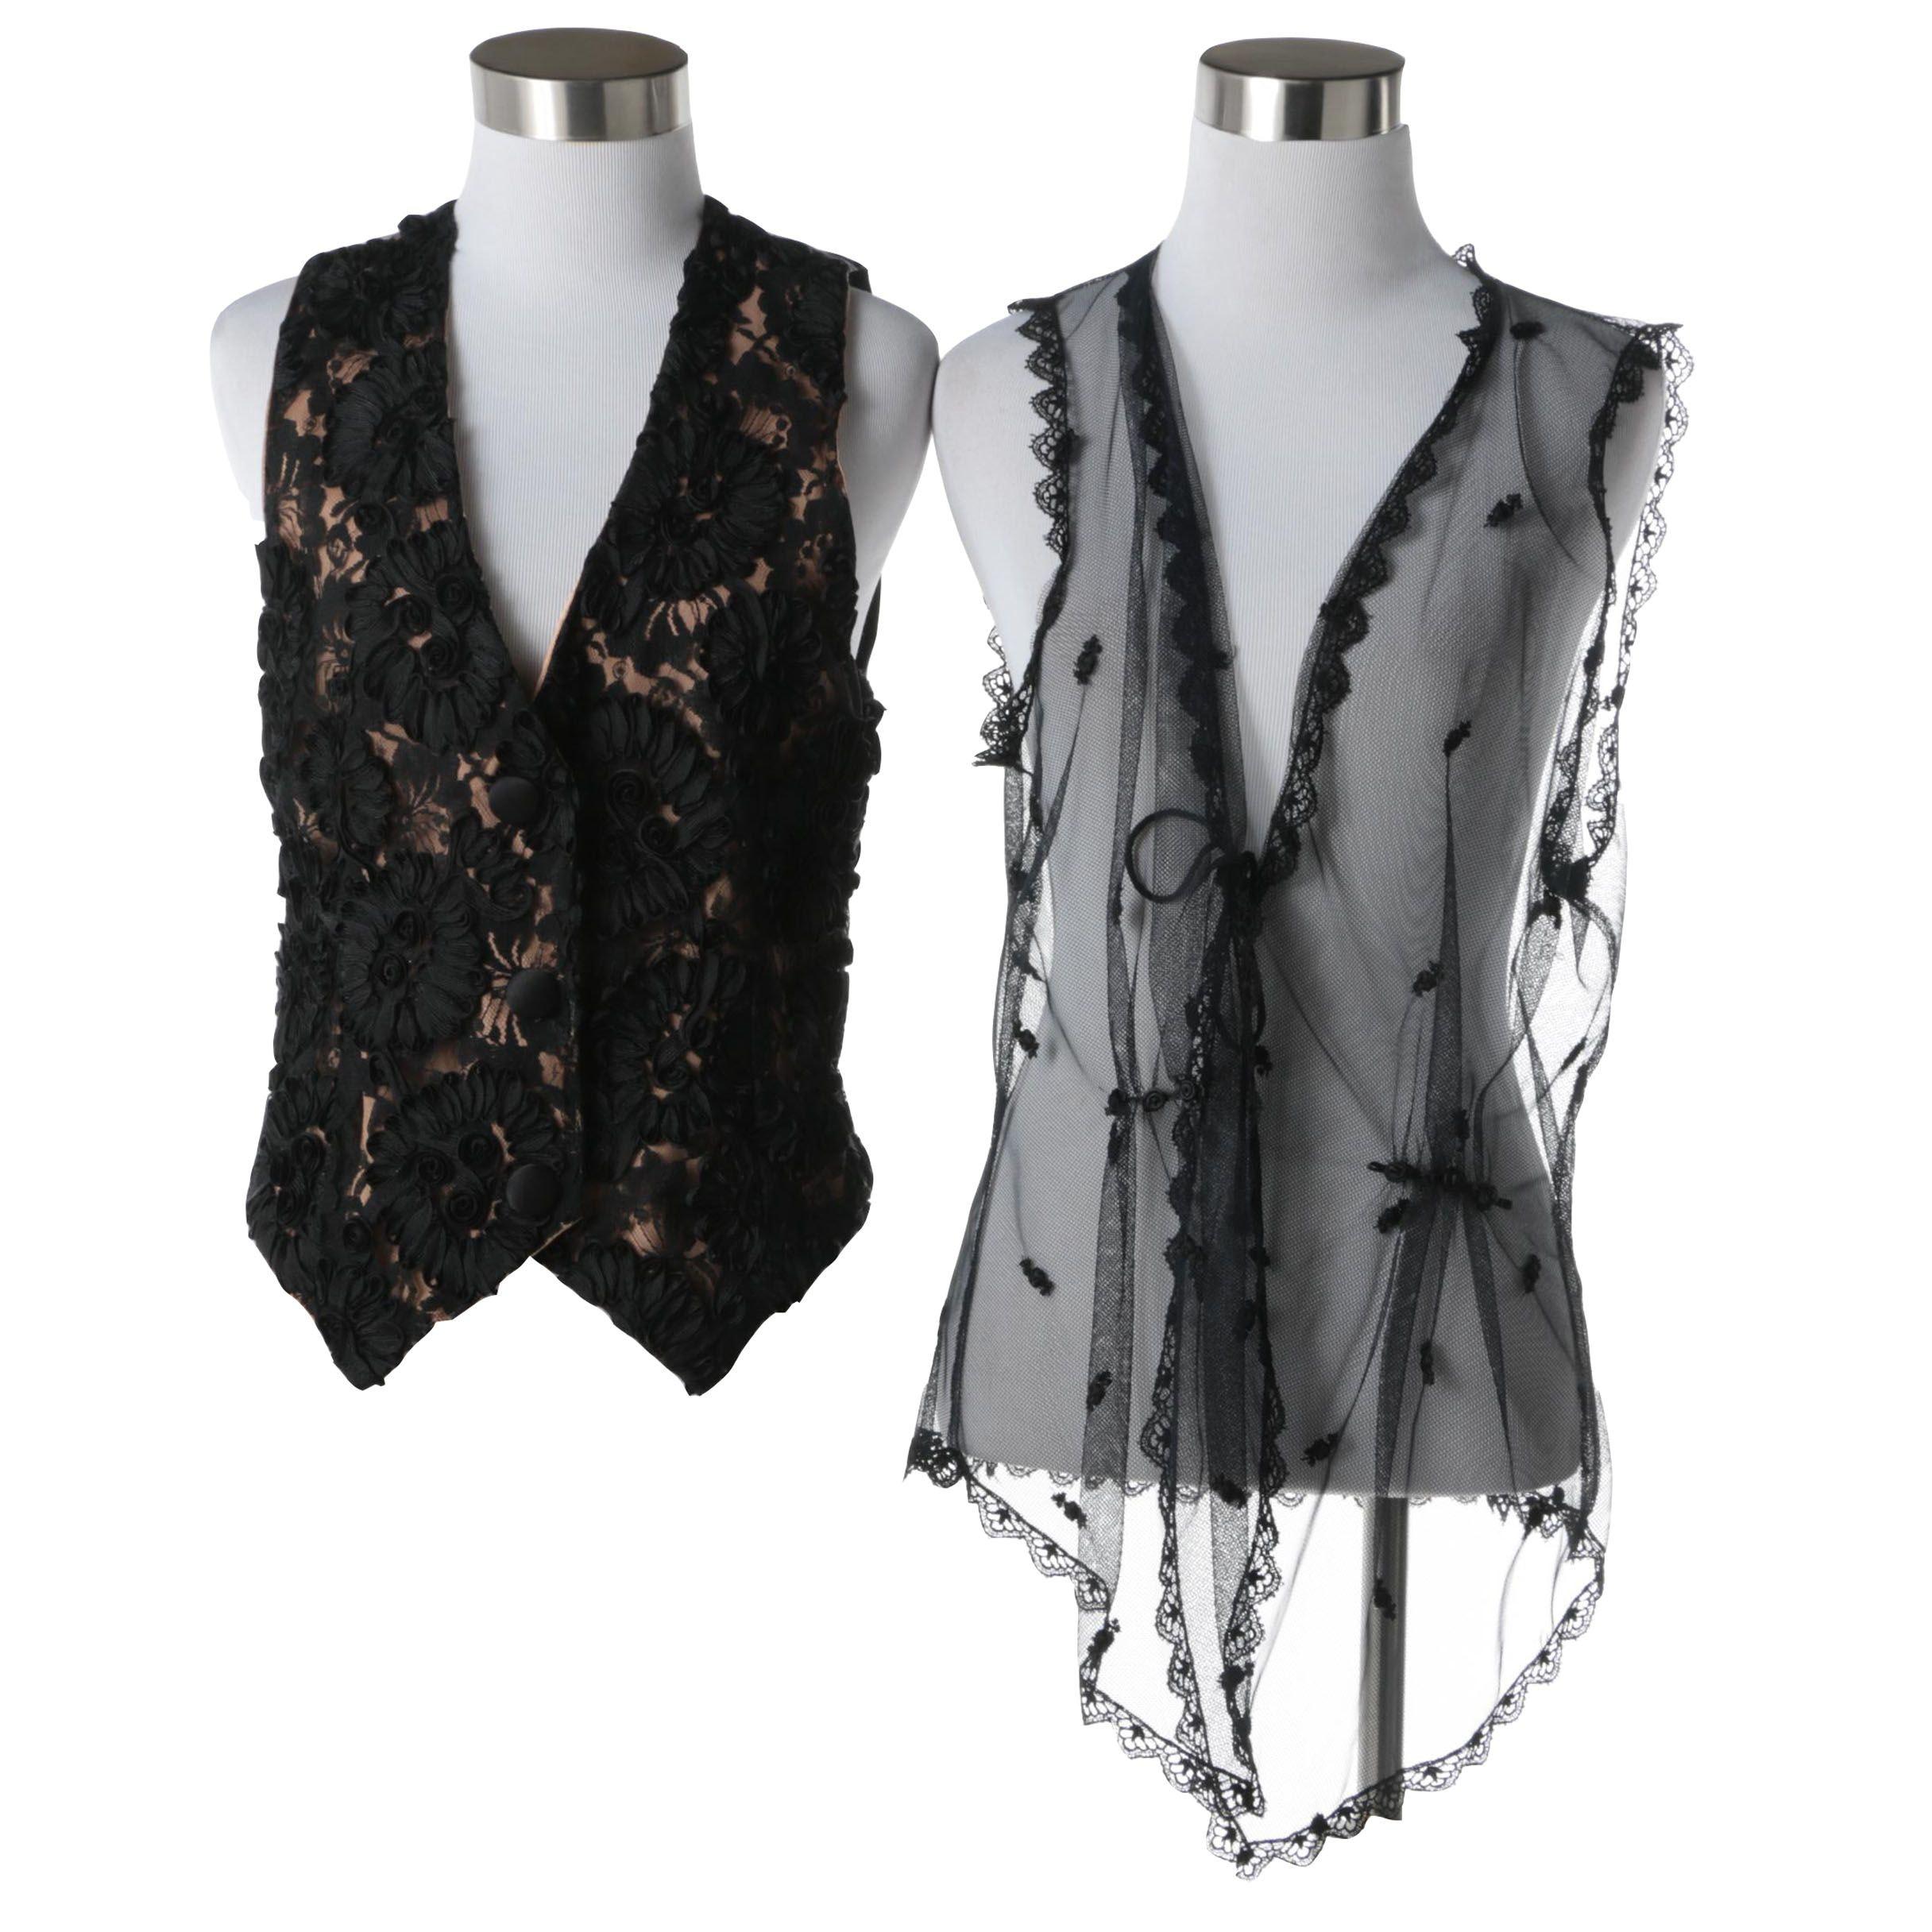 Women's Vests Featuring Adrienne Landau